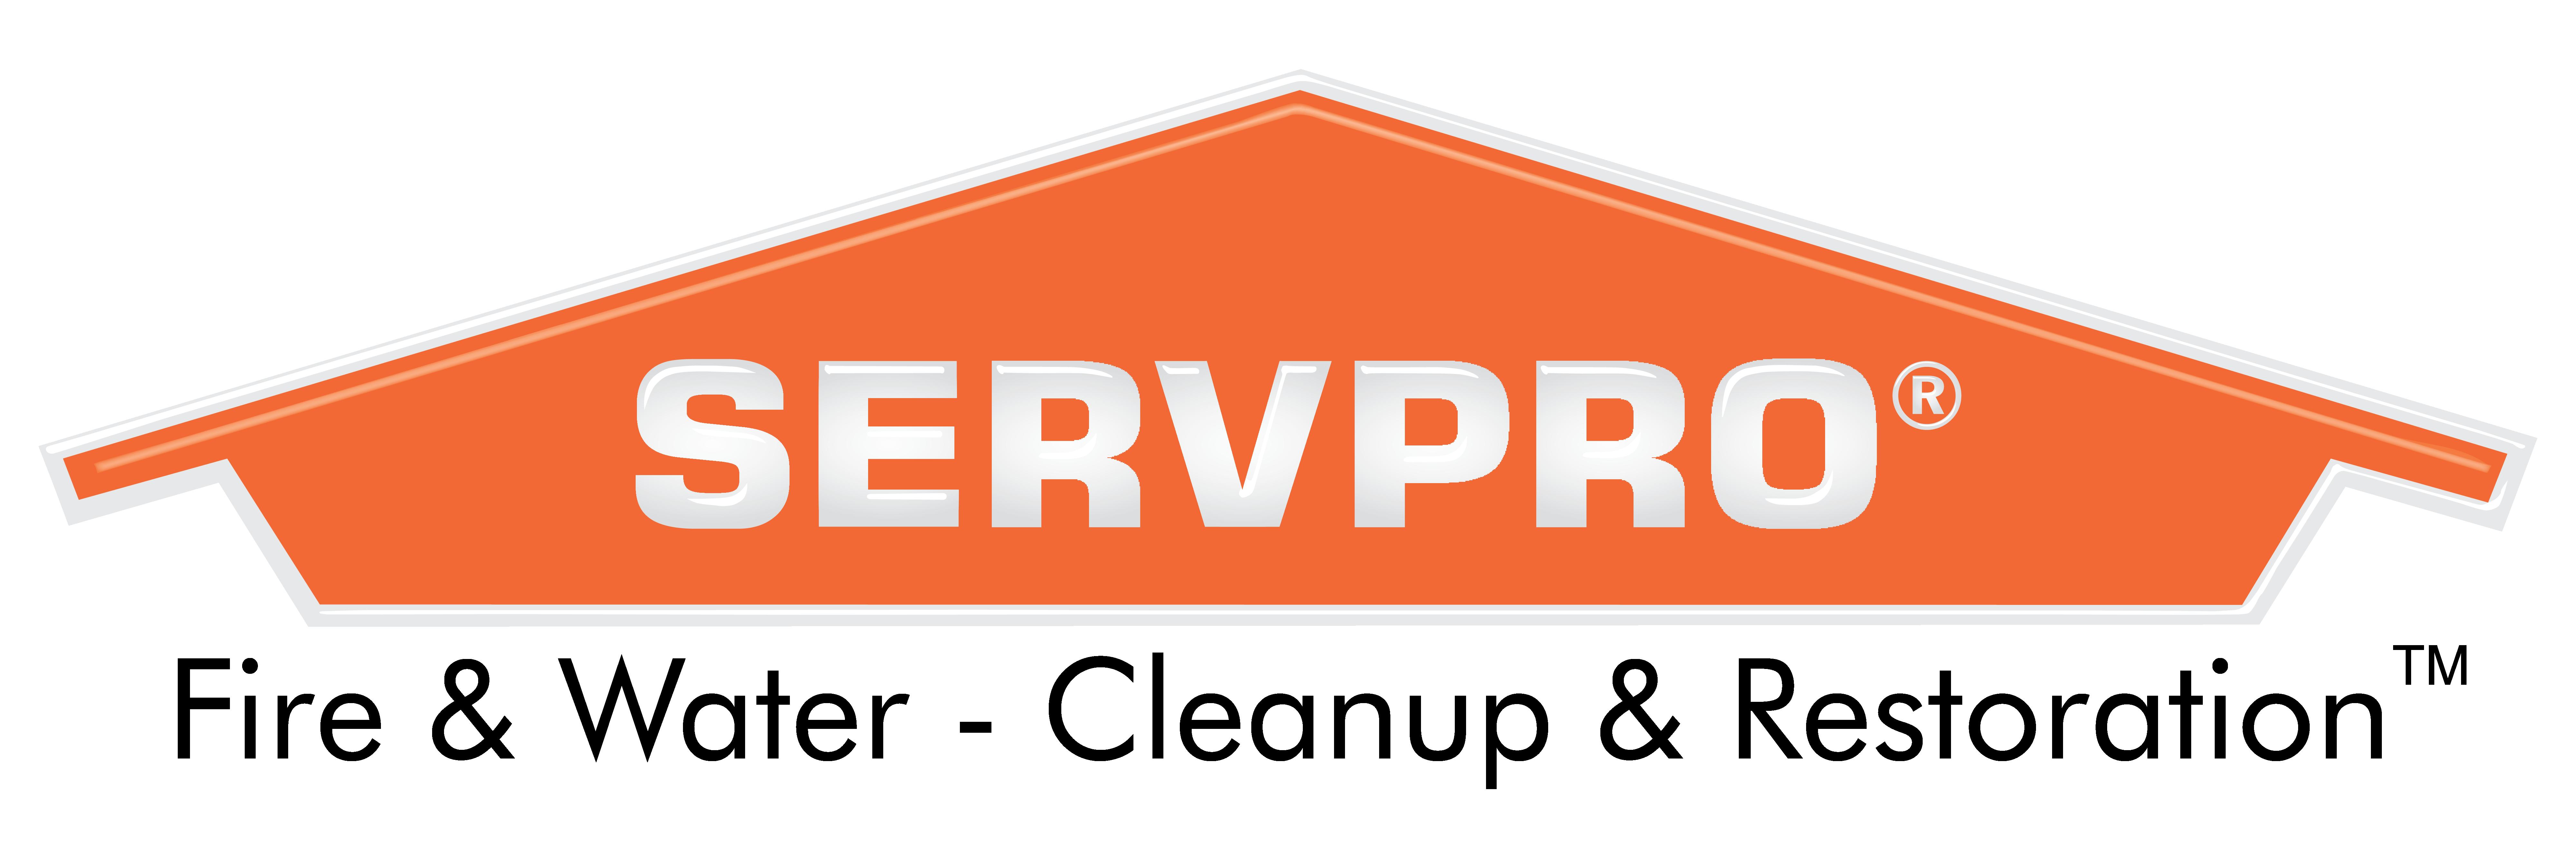 Servpro Industries, LLC logo